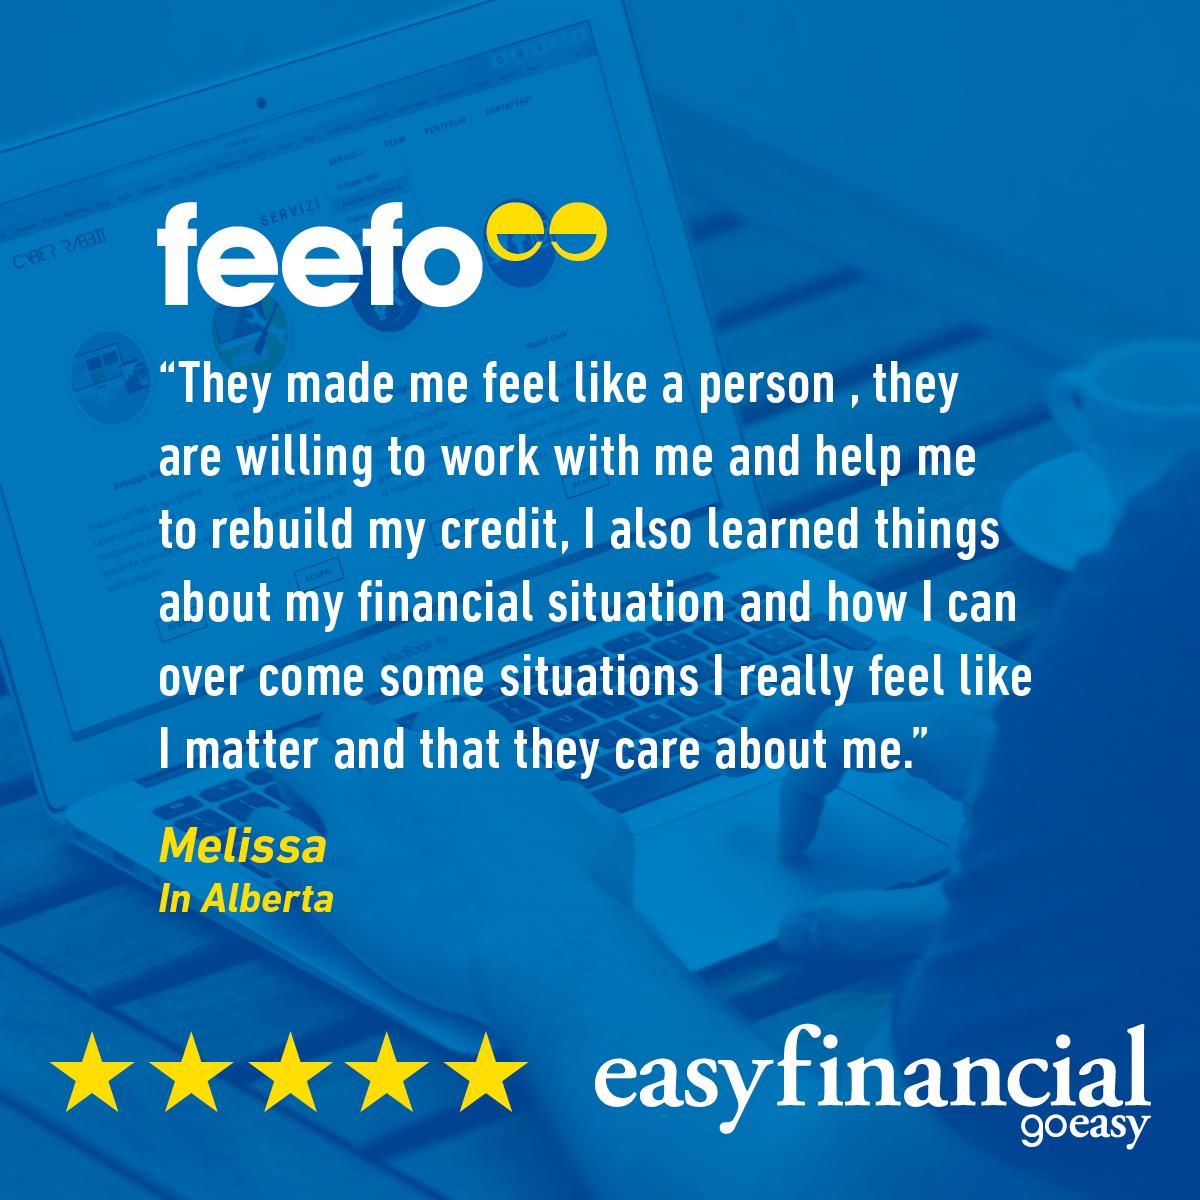 easyfinancial reviews